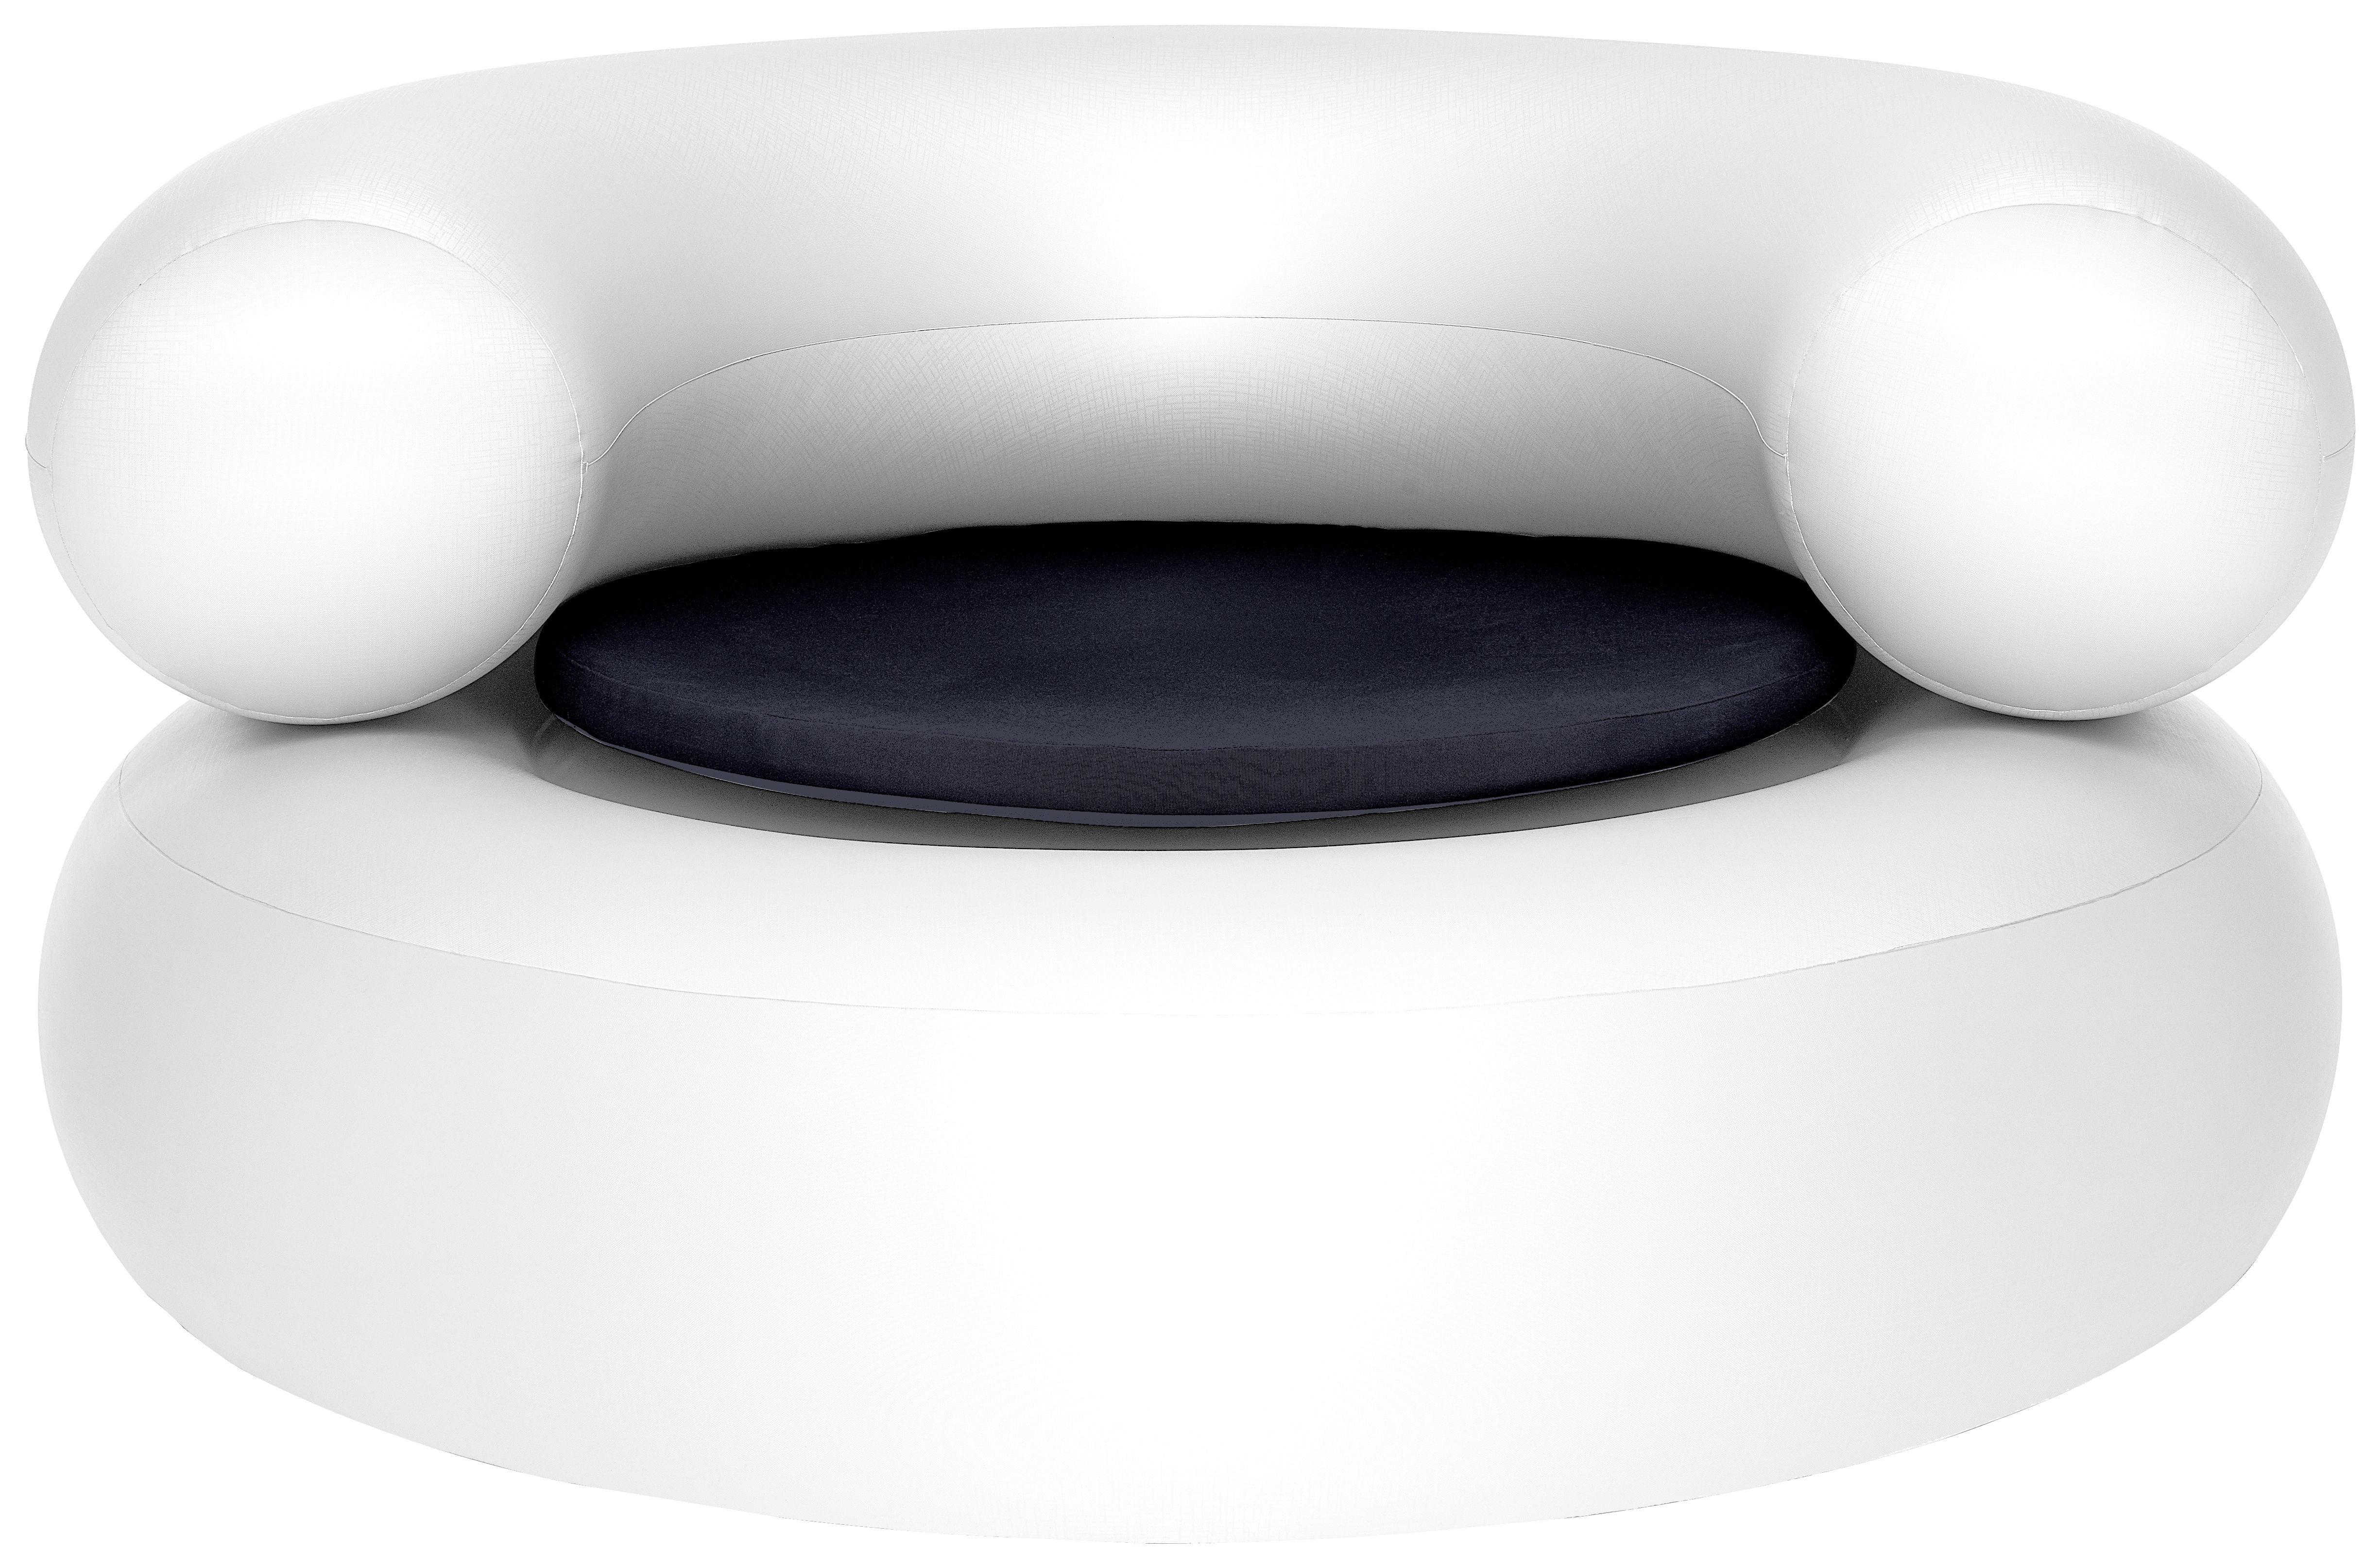 sitzkissen dunkelblau elegant kissen dunkelblau with. Black Bedroom Furniture Sets. Home Design Ideas